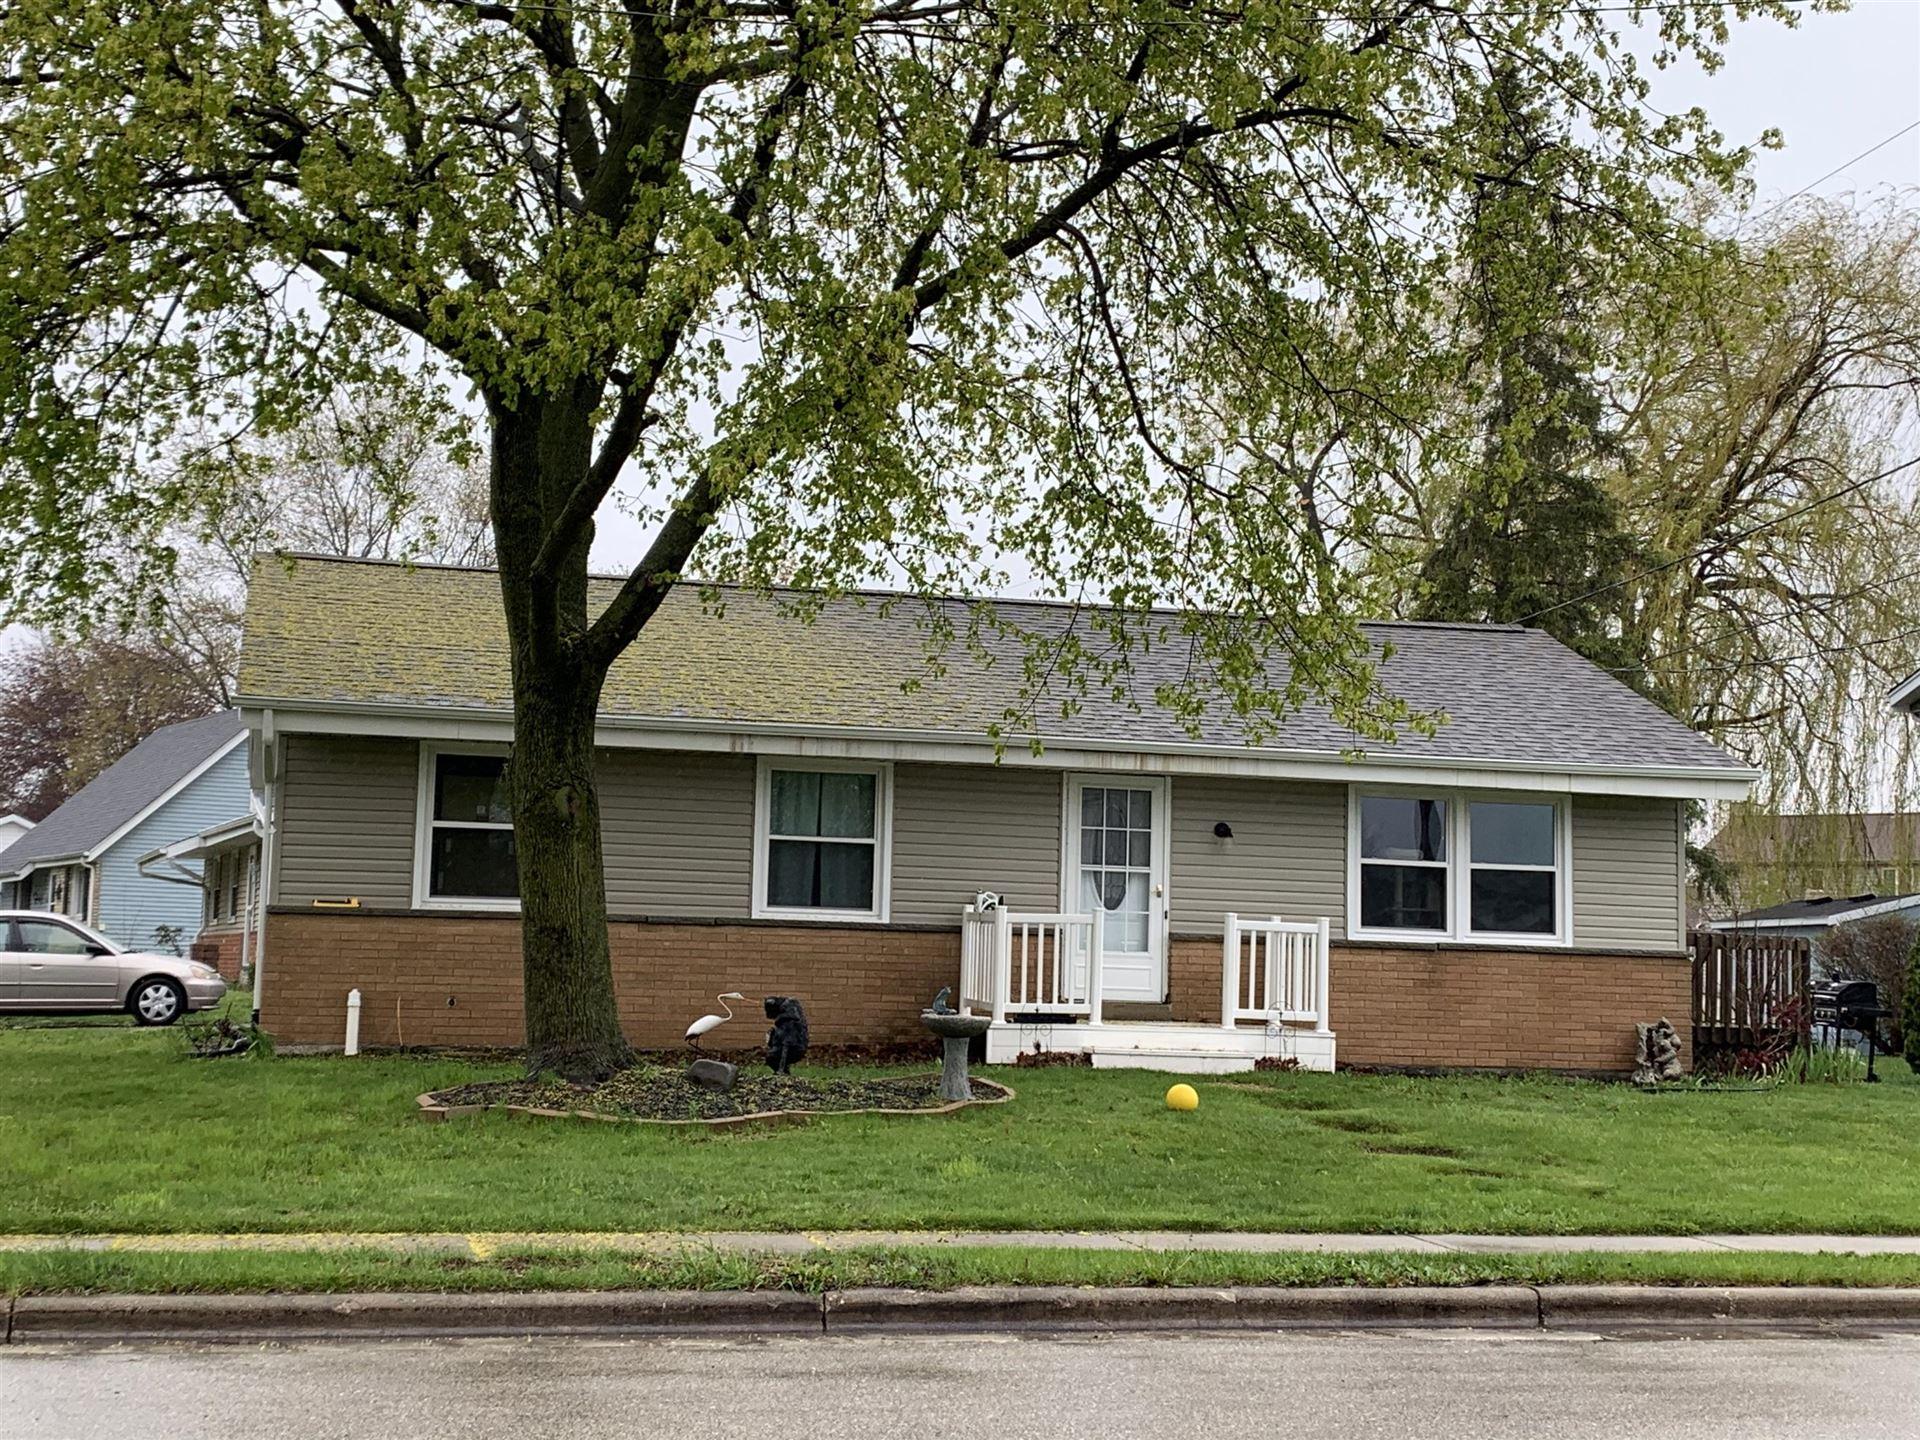 N171W20418 Ridge Rd, Jackson, WI 53037 - #: 1689596